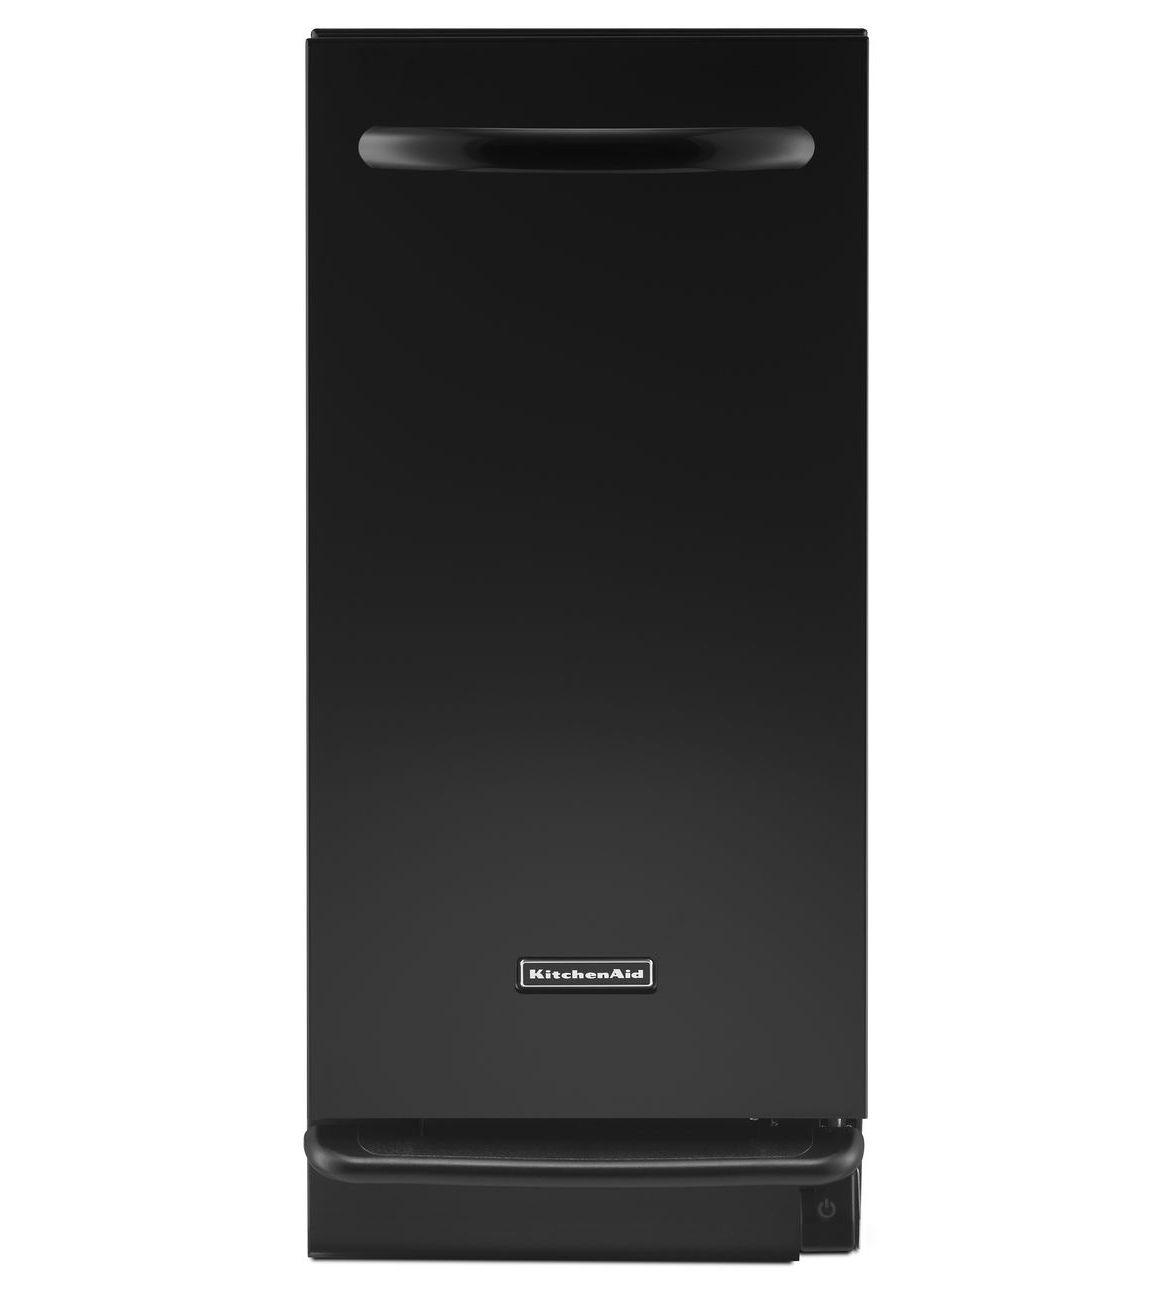 Kitchenaid Architect Series Black Trash Compactor